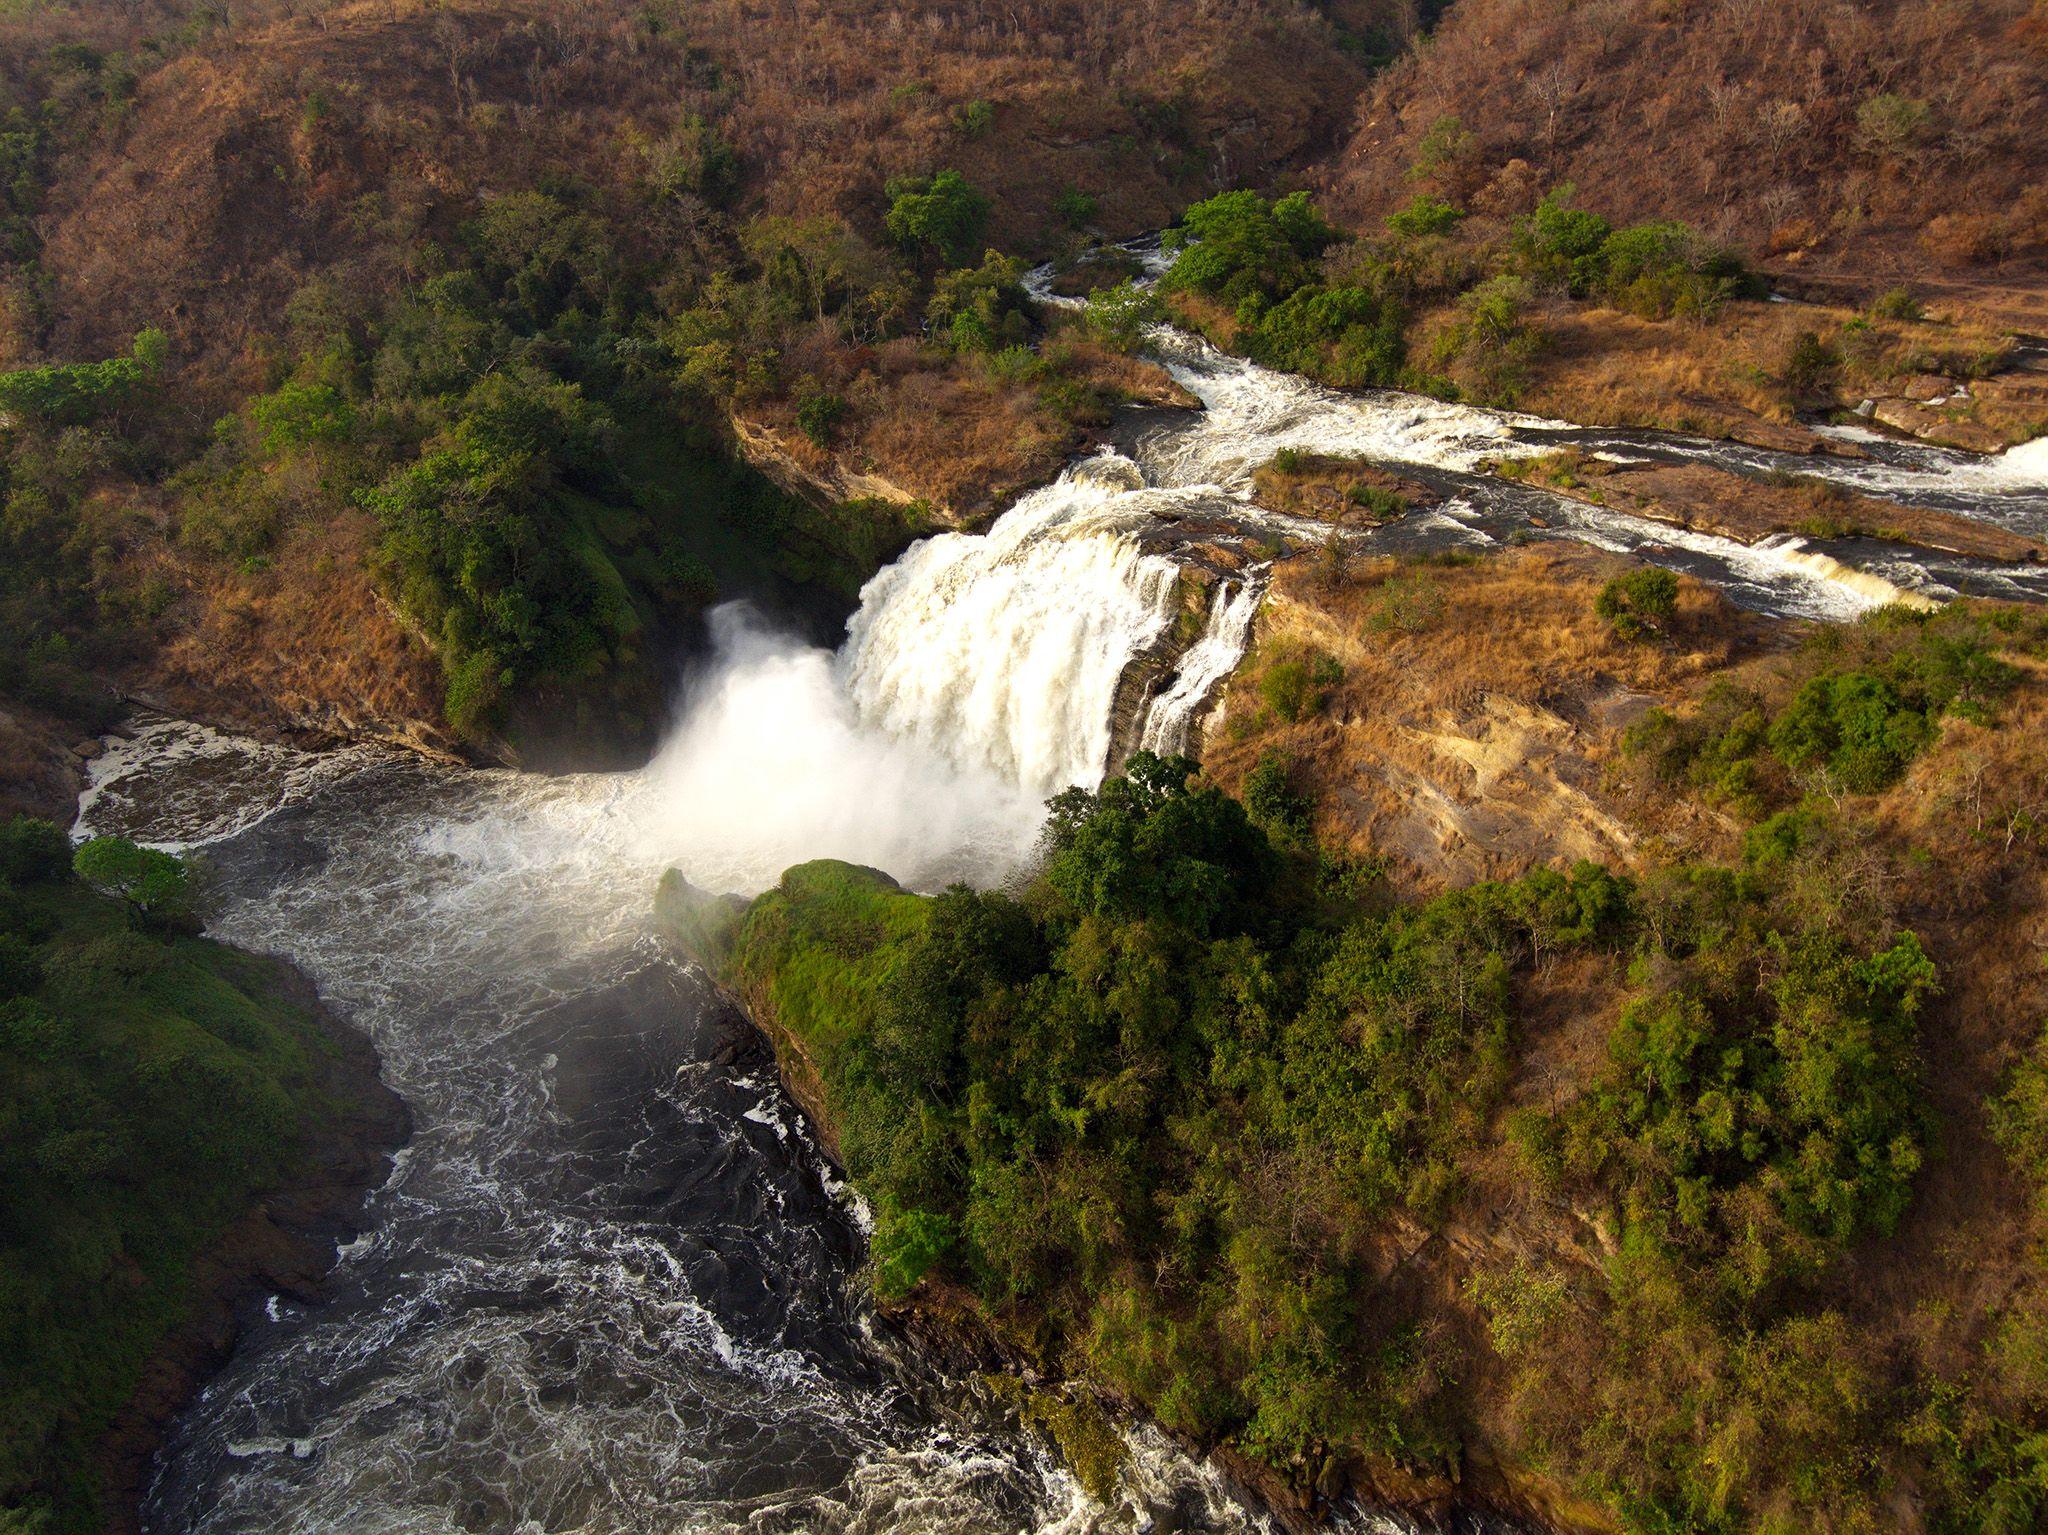 Uganda:  Nile, Rapids Murchison Falls, Murchison Falls National Park. This image is from Wild... [Foto del giorno - settembre 2018]